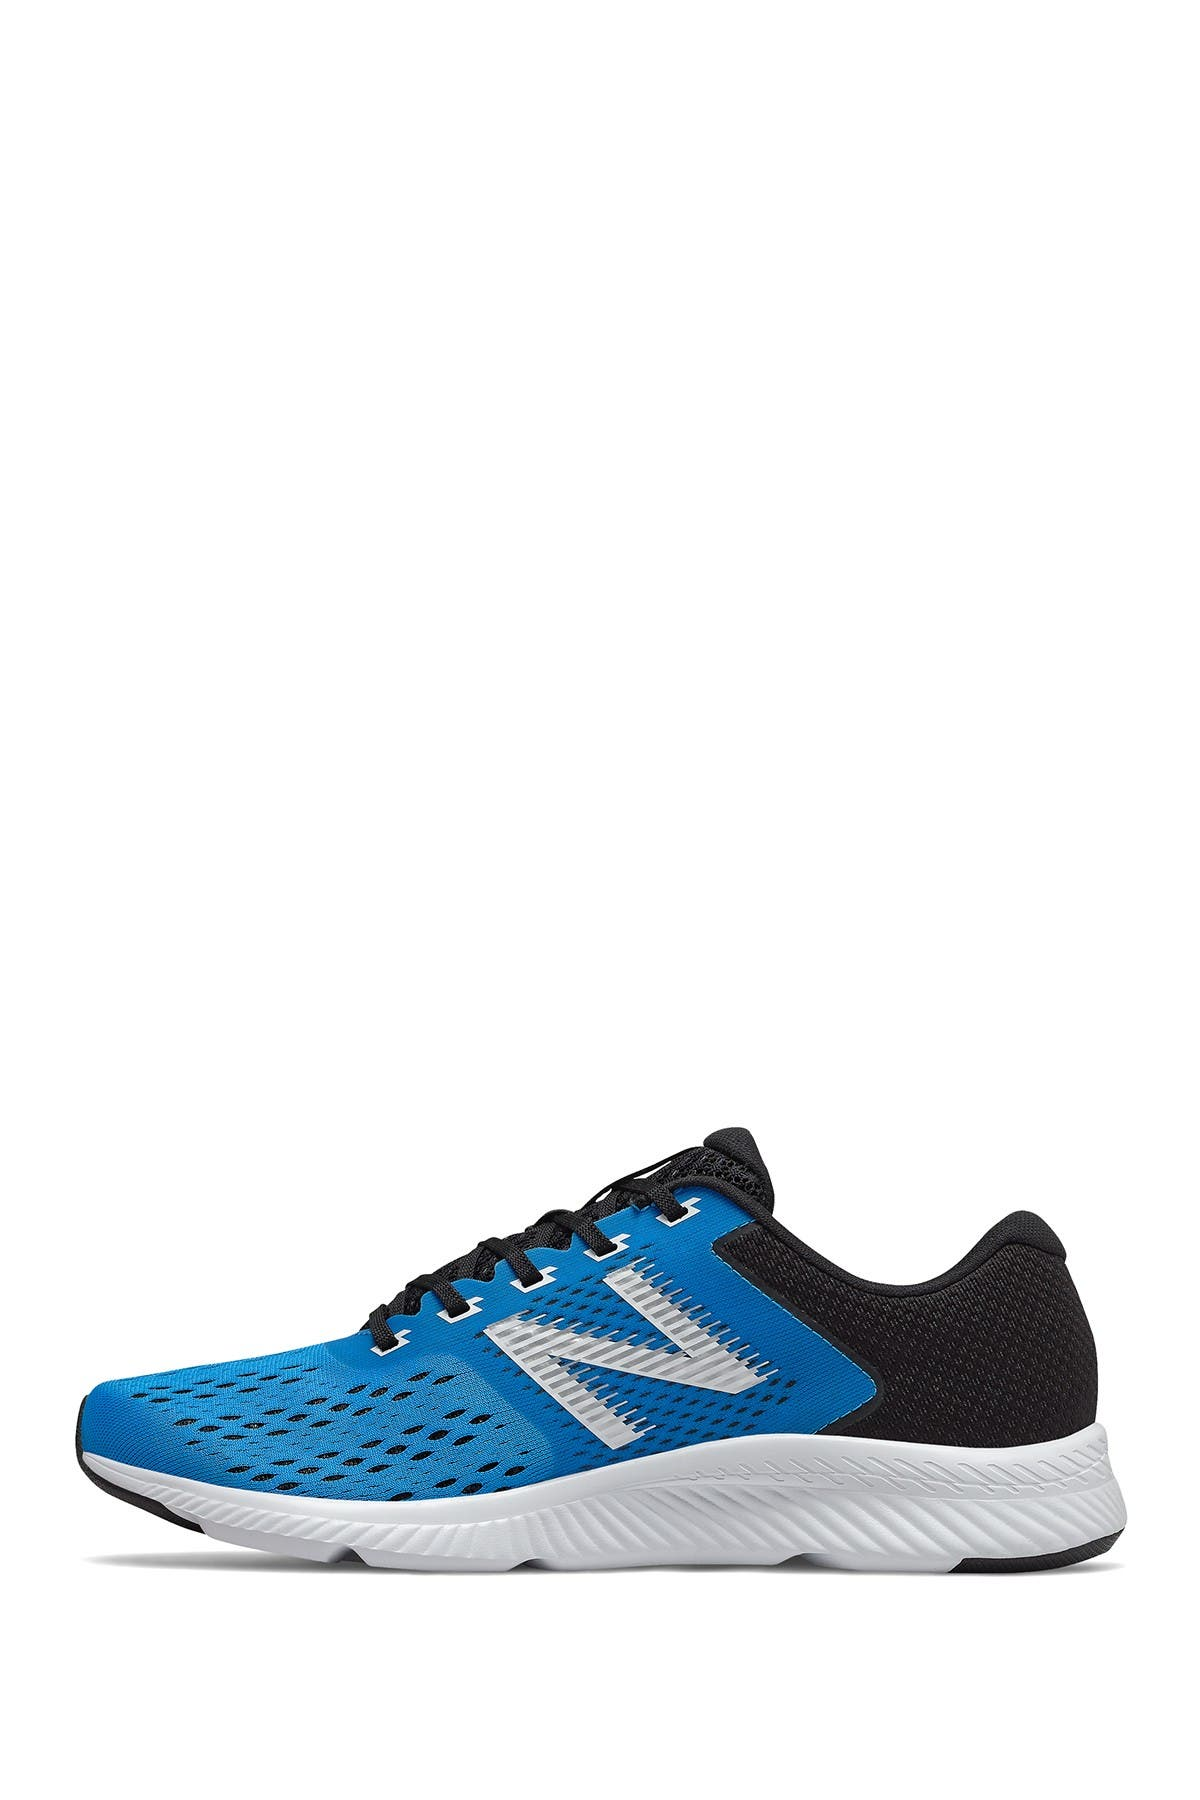 Image of New Balance DraftV1 Running Shoe